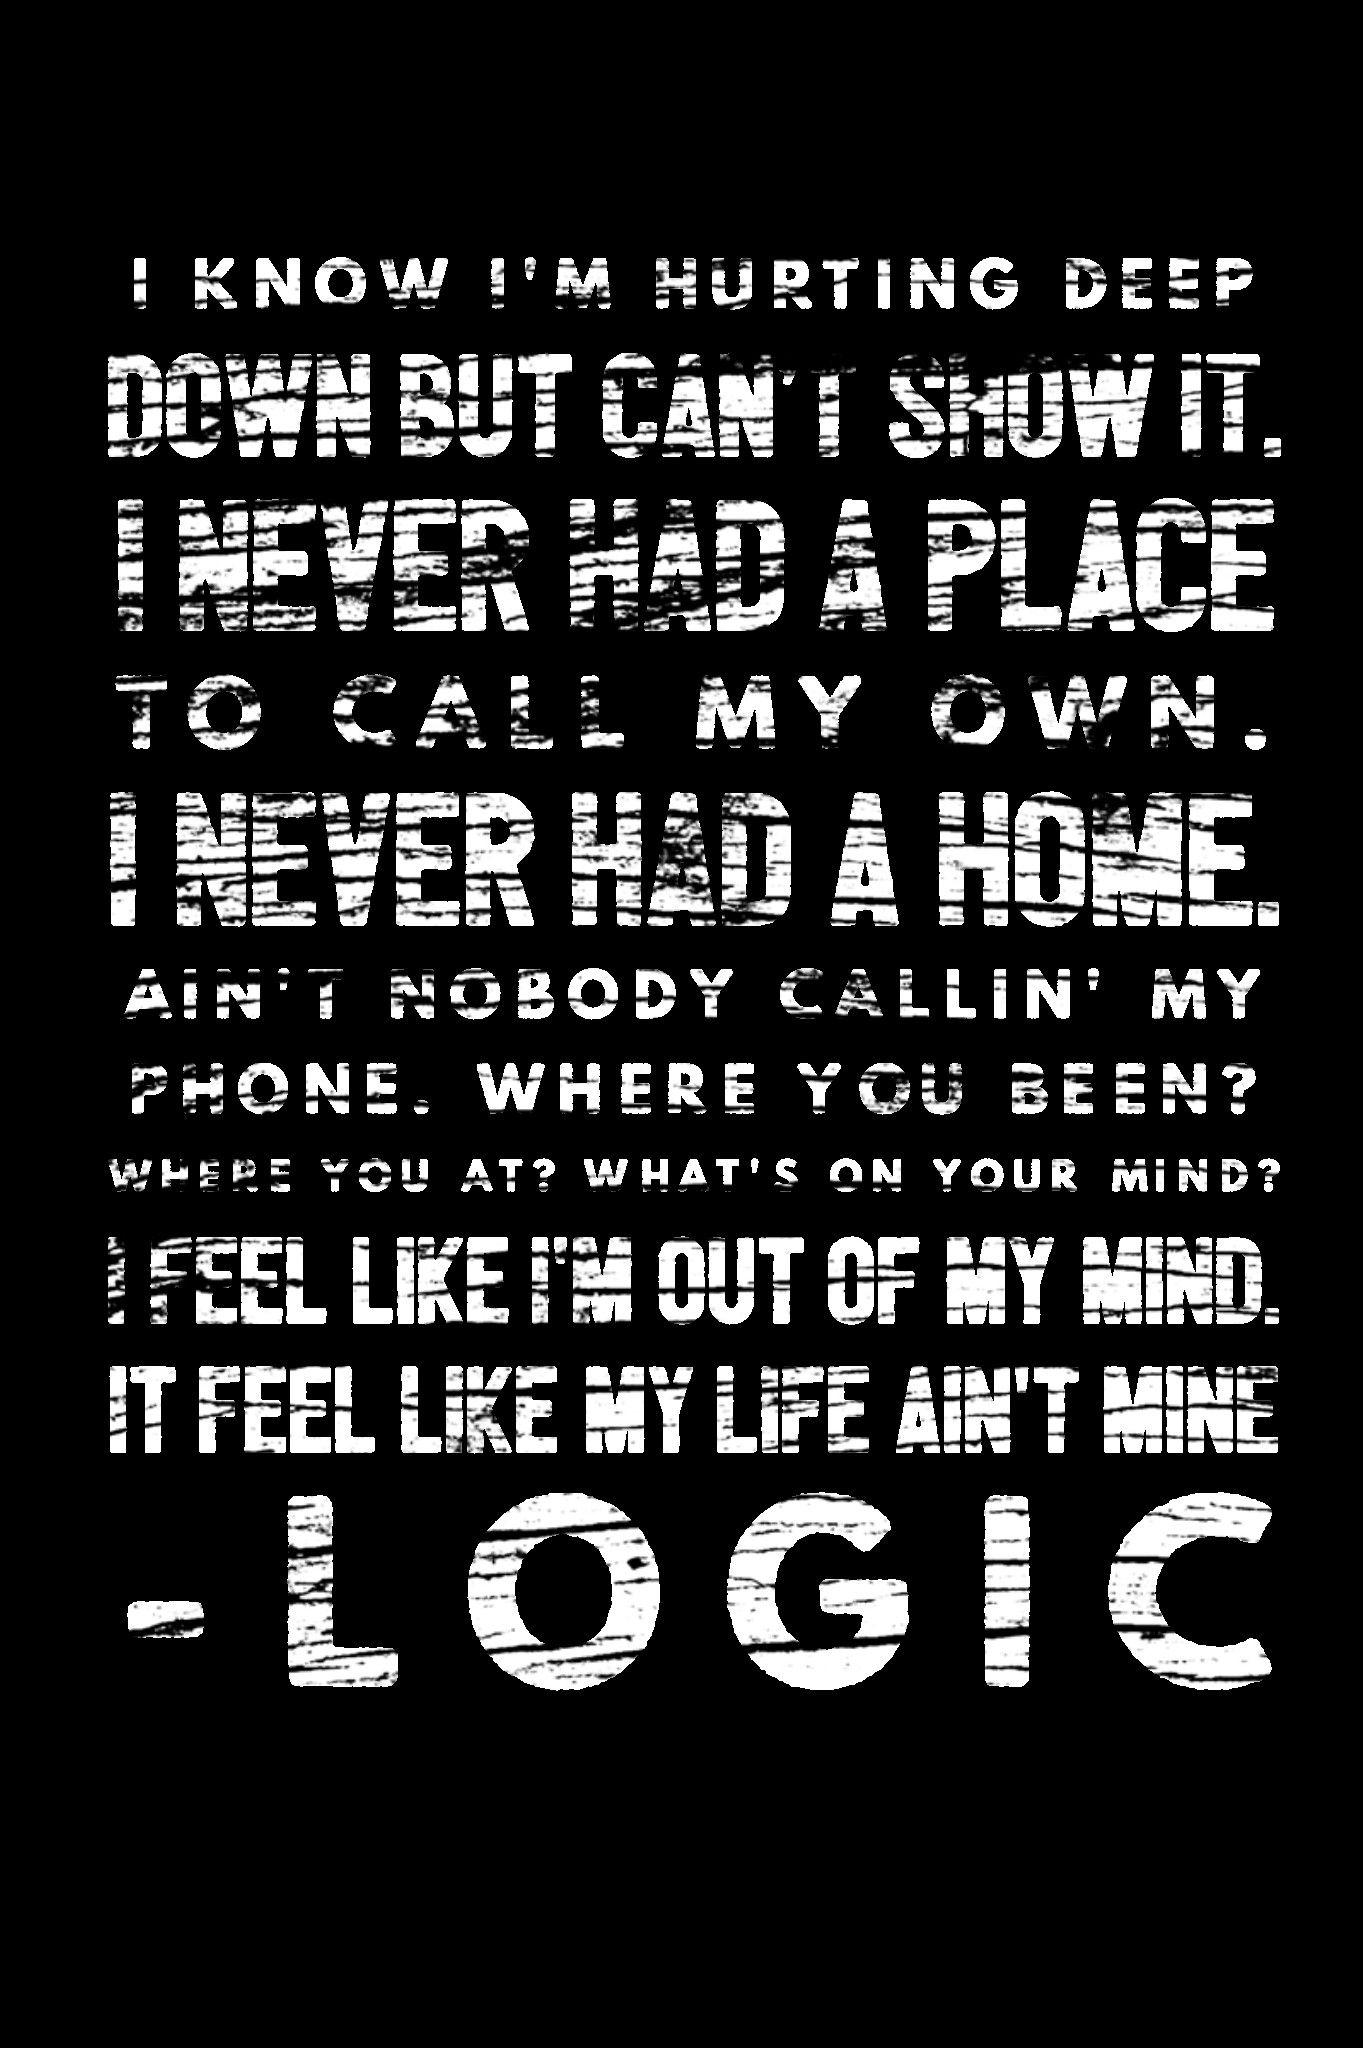 Khalid Song Quotes Wallpaper Logic 1 800 273 8255 Ft Alessia Cara Amp Khalid